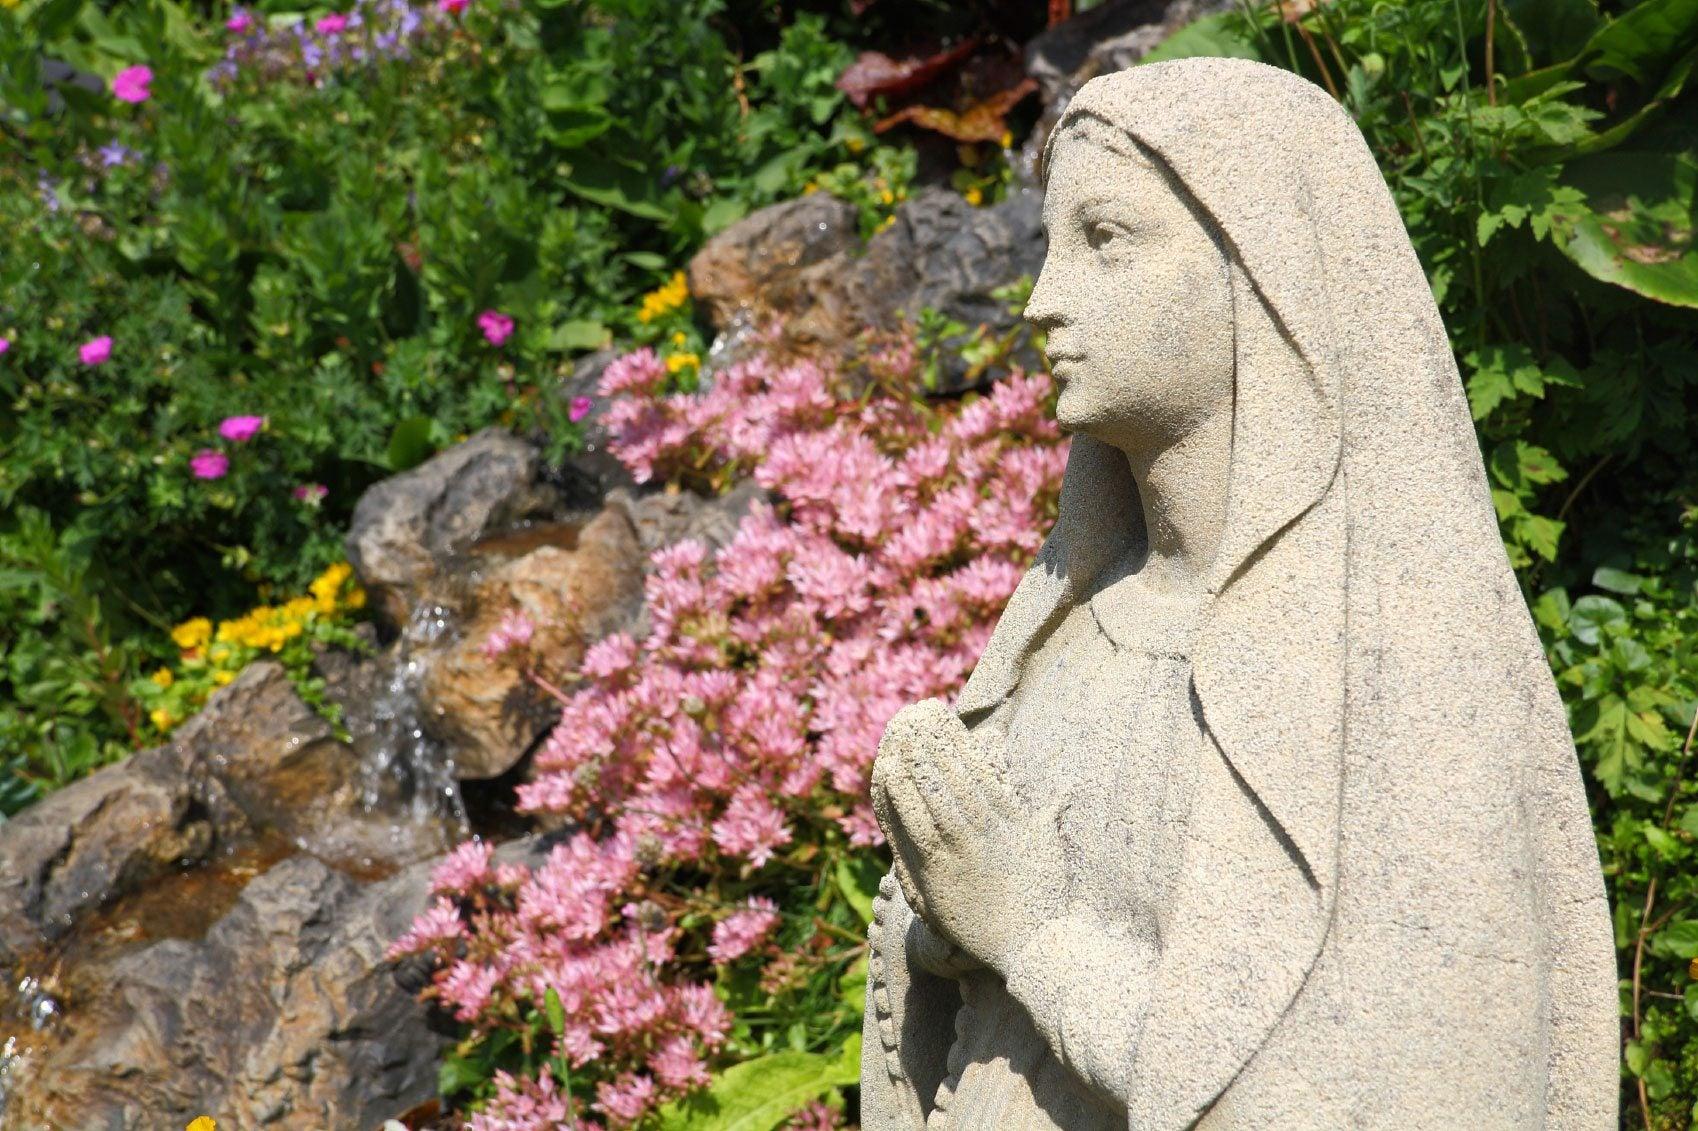 Bible garden plants how to make a biblical flower garden for Garden design bible